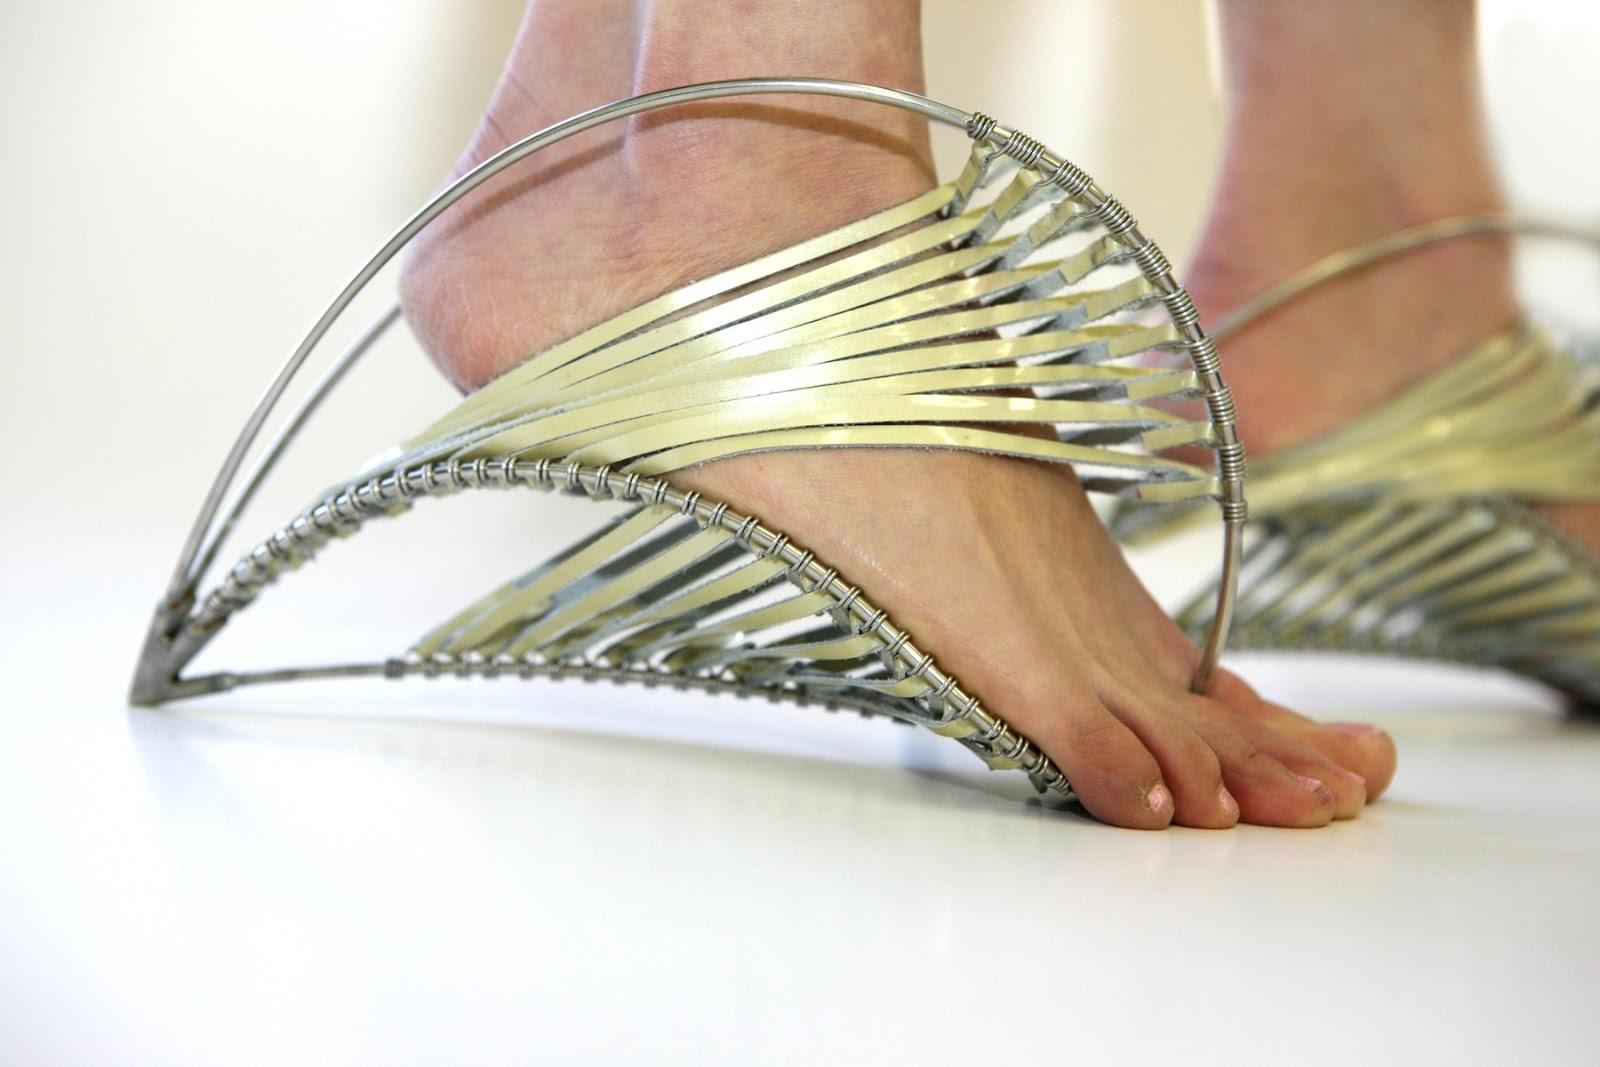 35-Naomi-Hertz_Bridge-shoes.nocrop.w1800.h1330